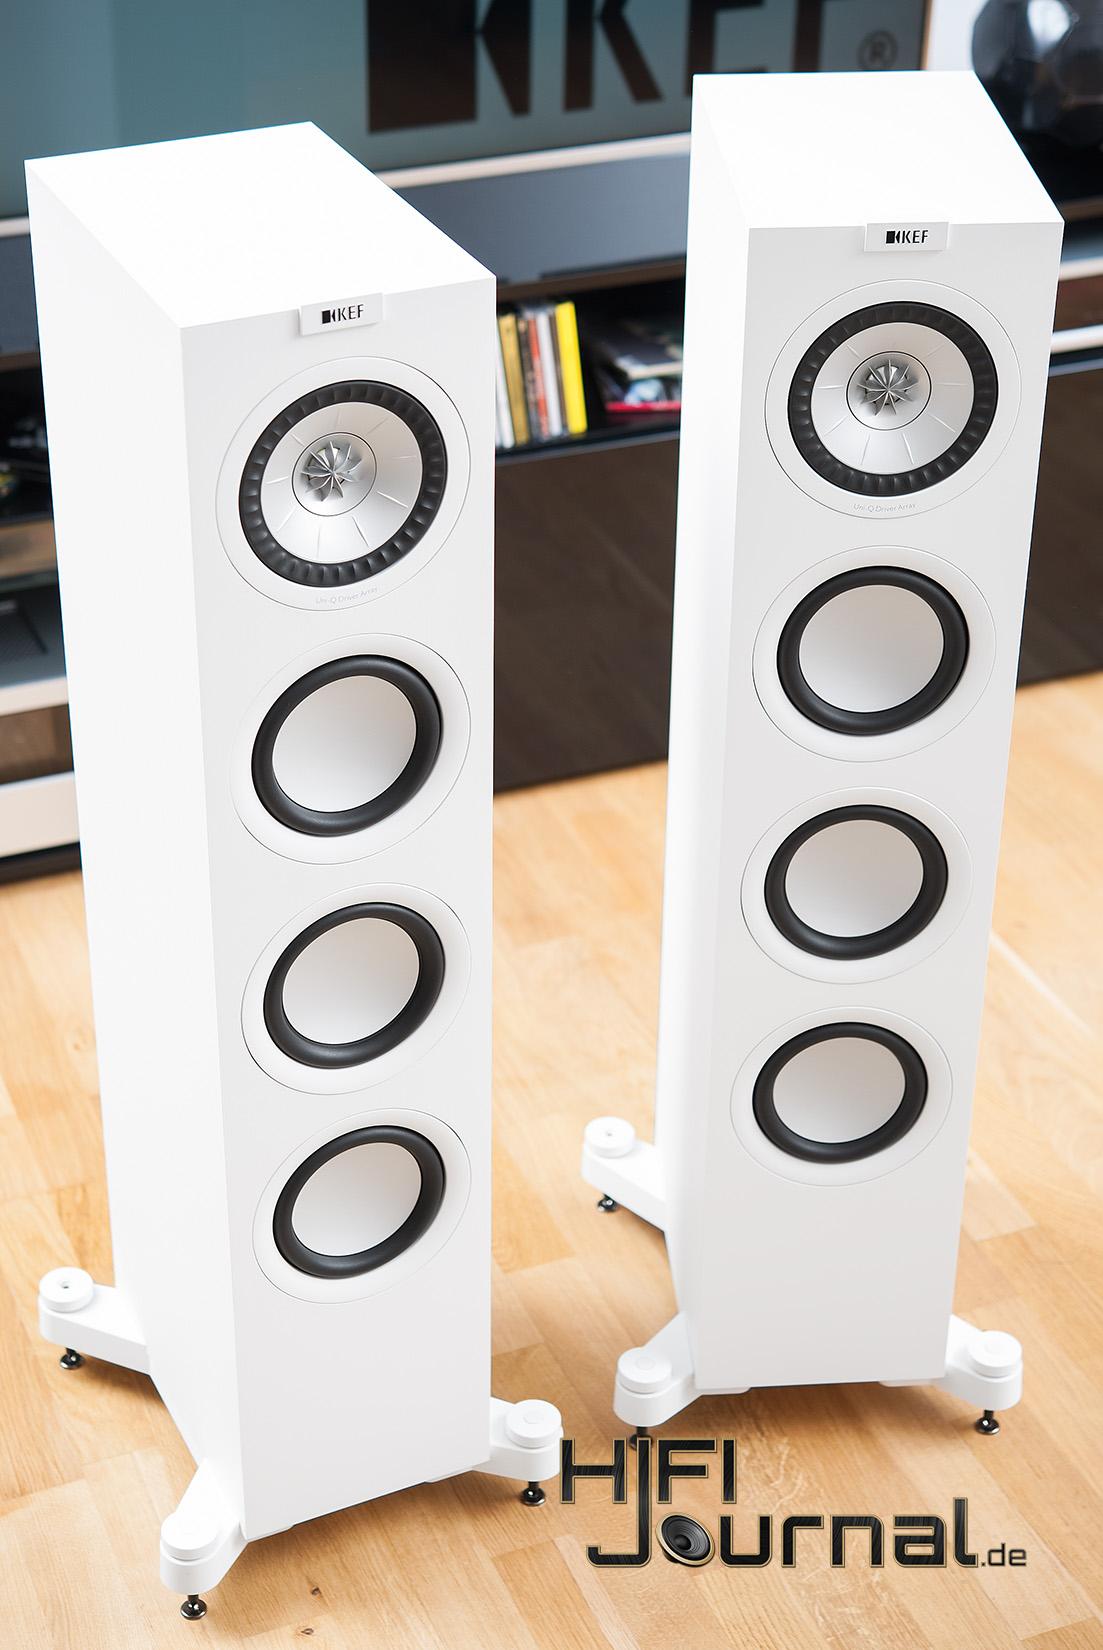 test kef q550 standlautsprecher hifi journal results. Black Bedroom Furniture Sets. Home Design Ideas